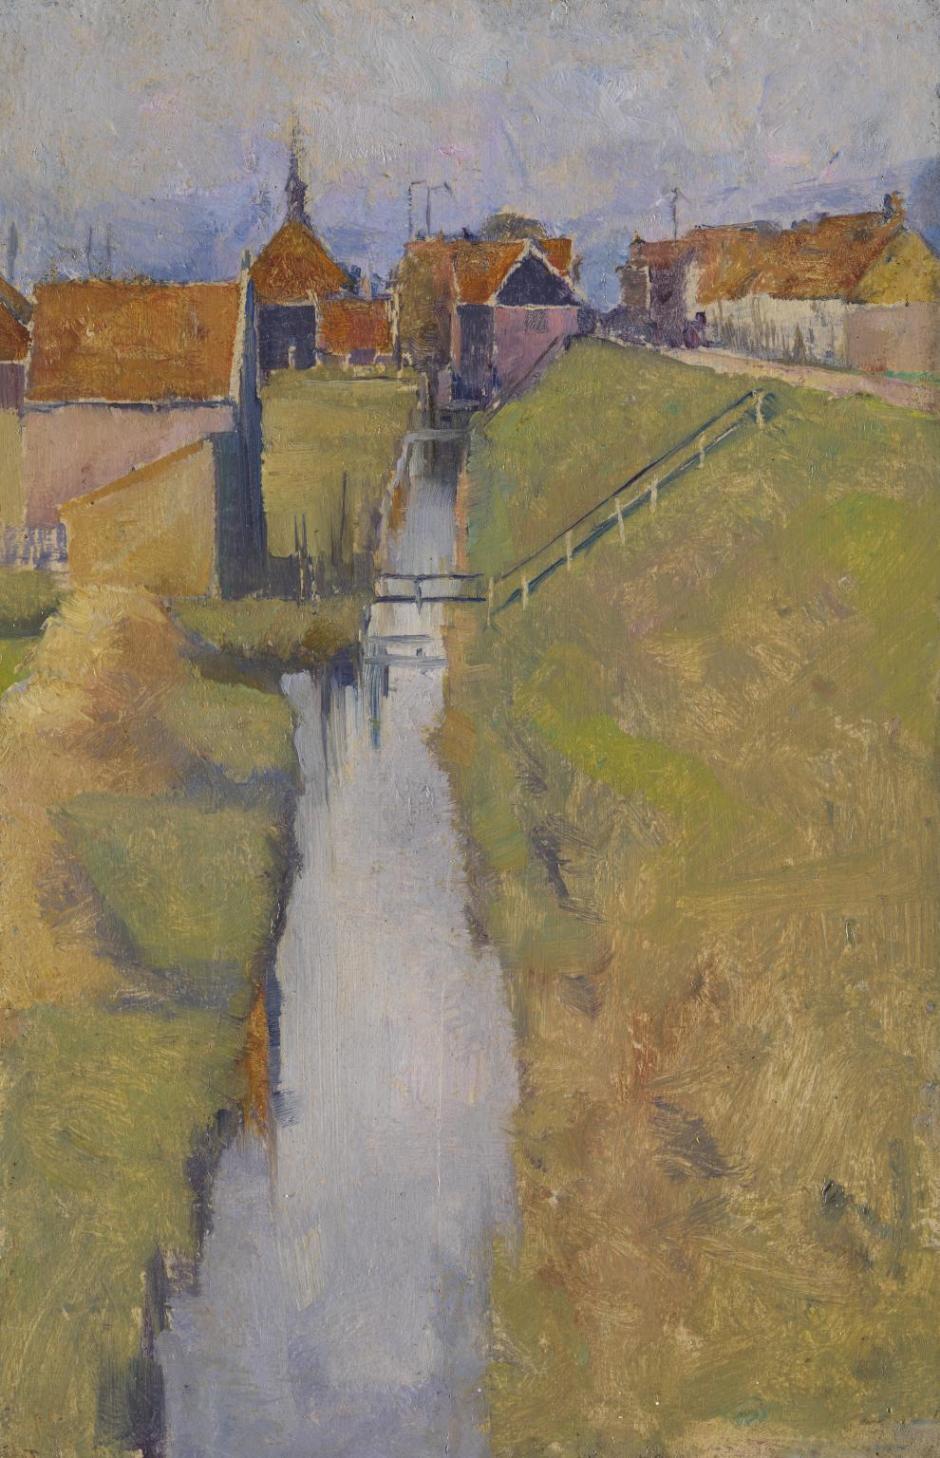 Volendam, Holland, from the Zuidende ?1895 by Elizabeth Forbes 1859-1912